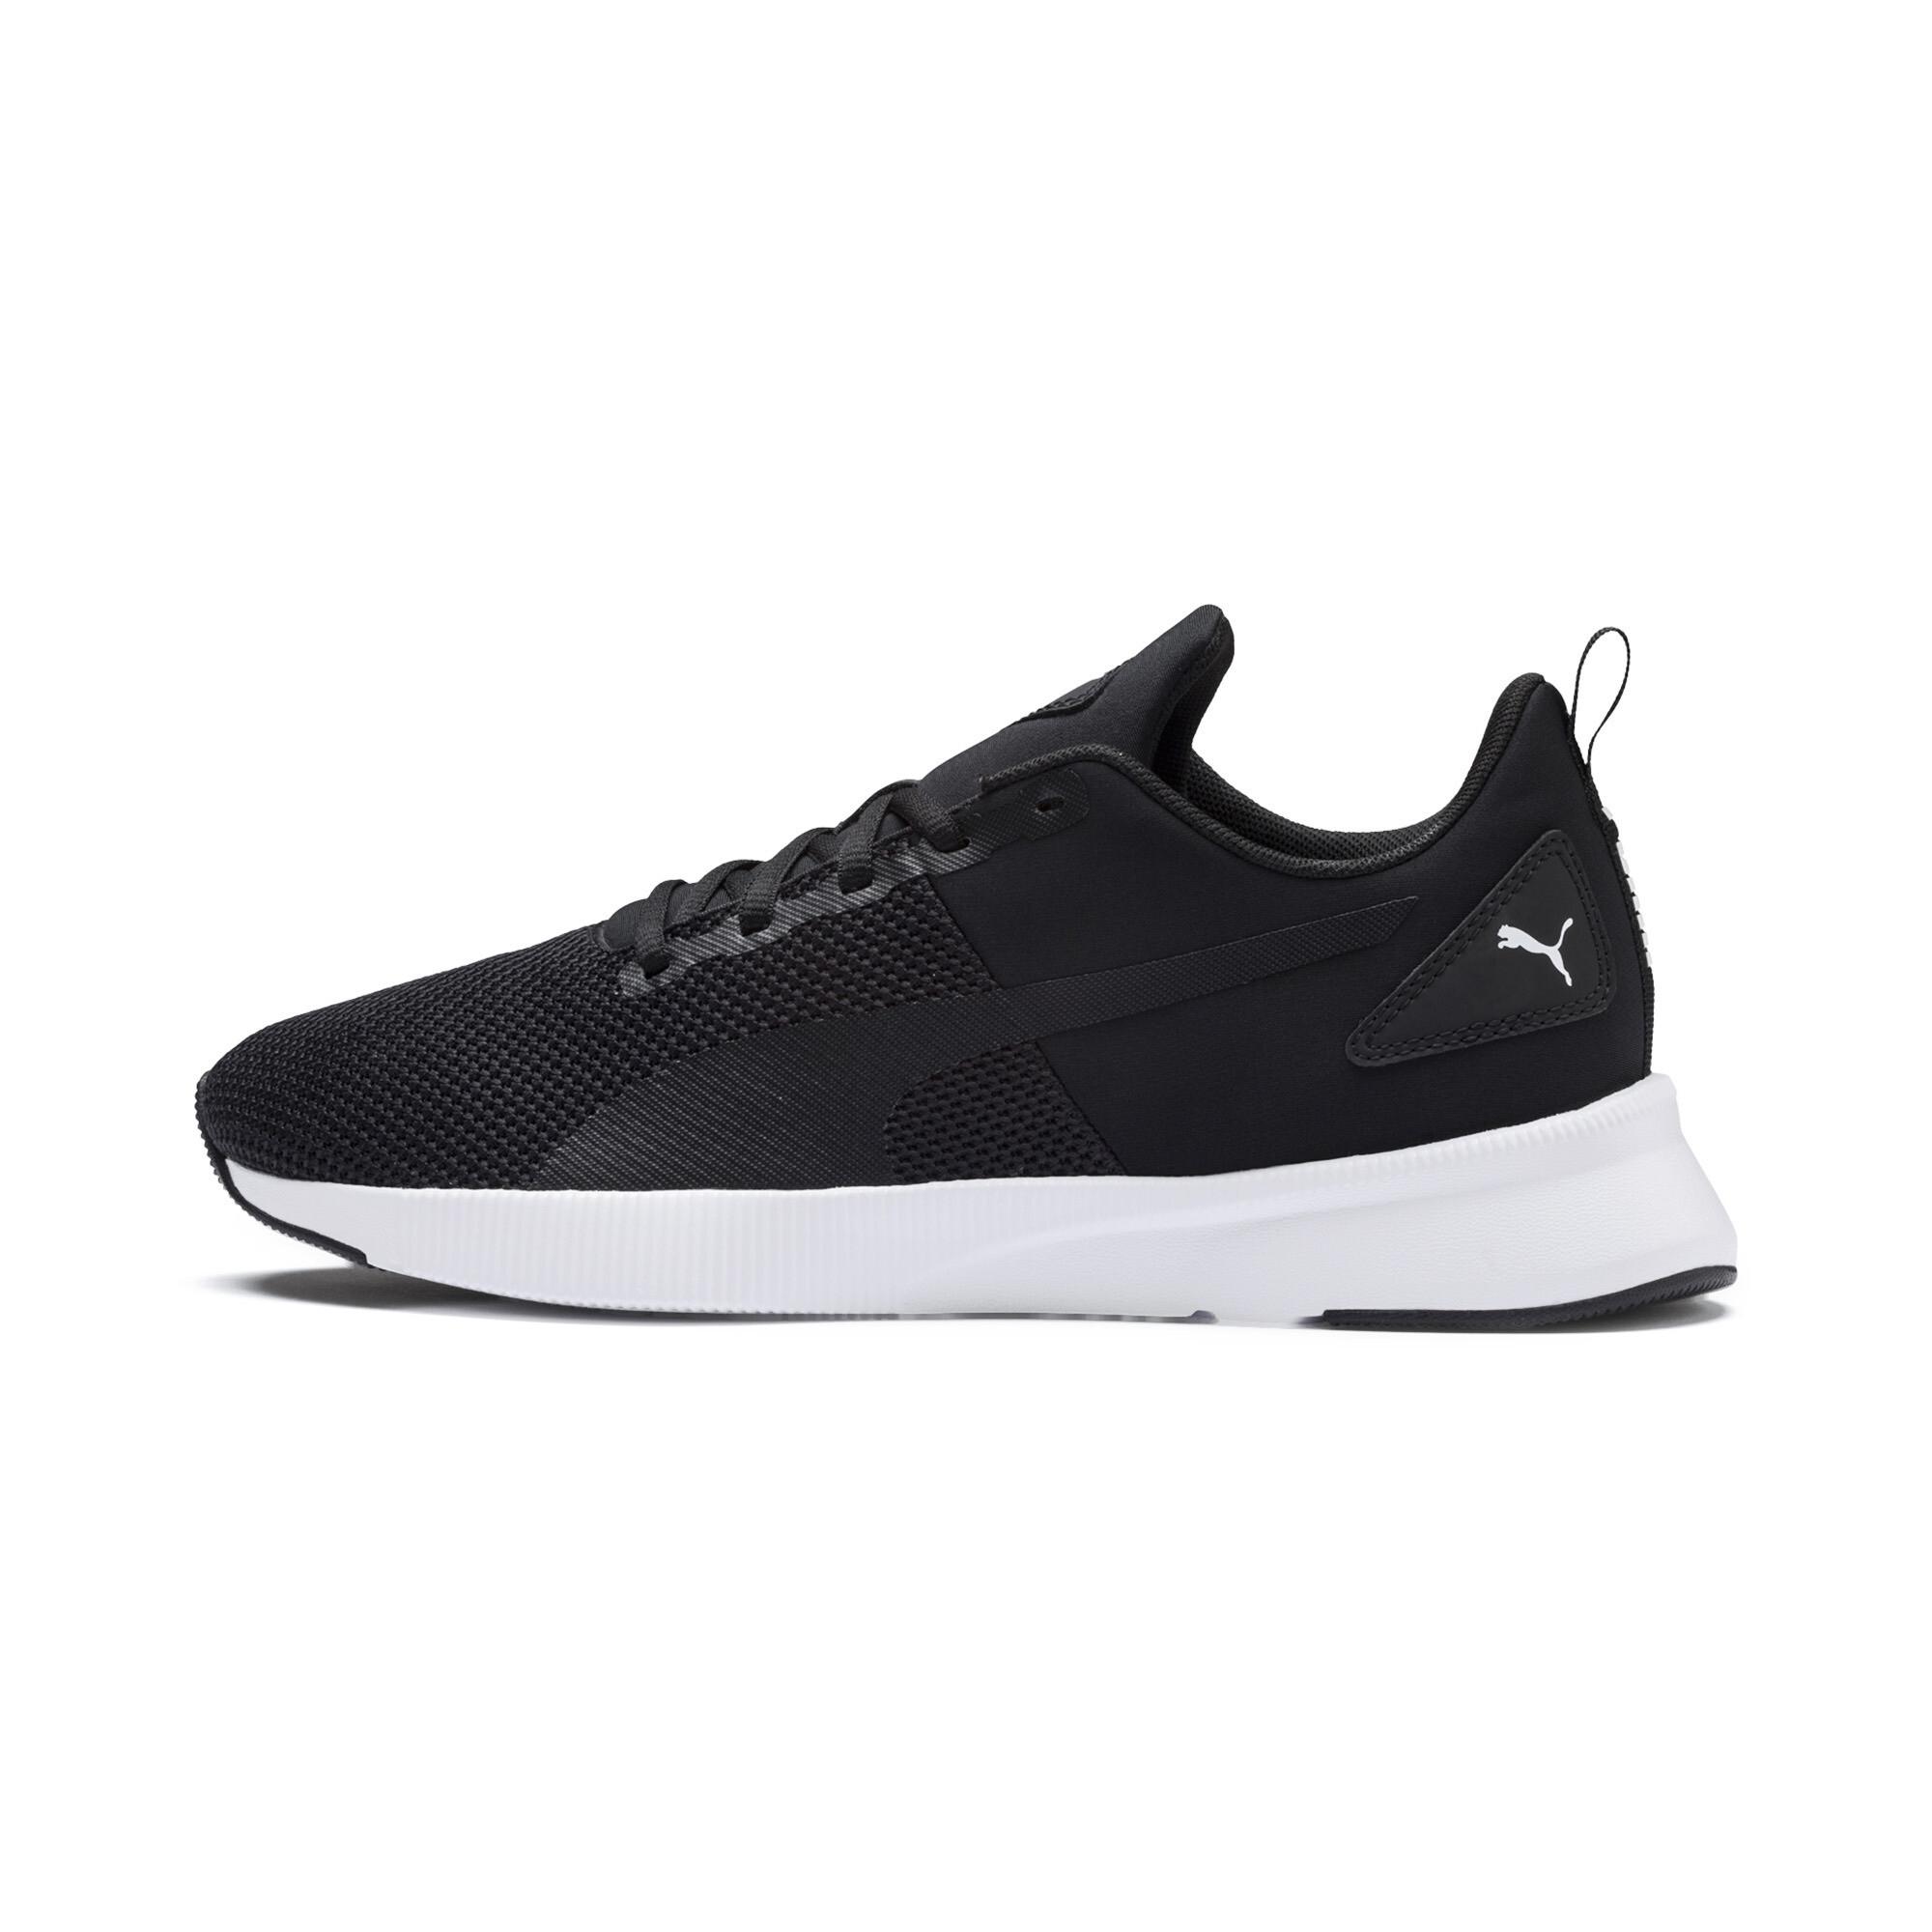 PUMA-Flyer-Runner-Running-Shoes-Mens-Shoe-Running thumbnail 4